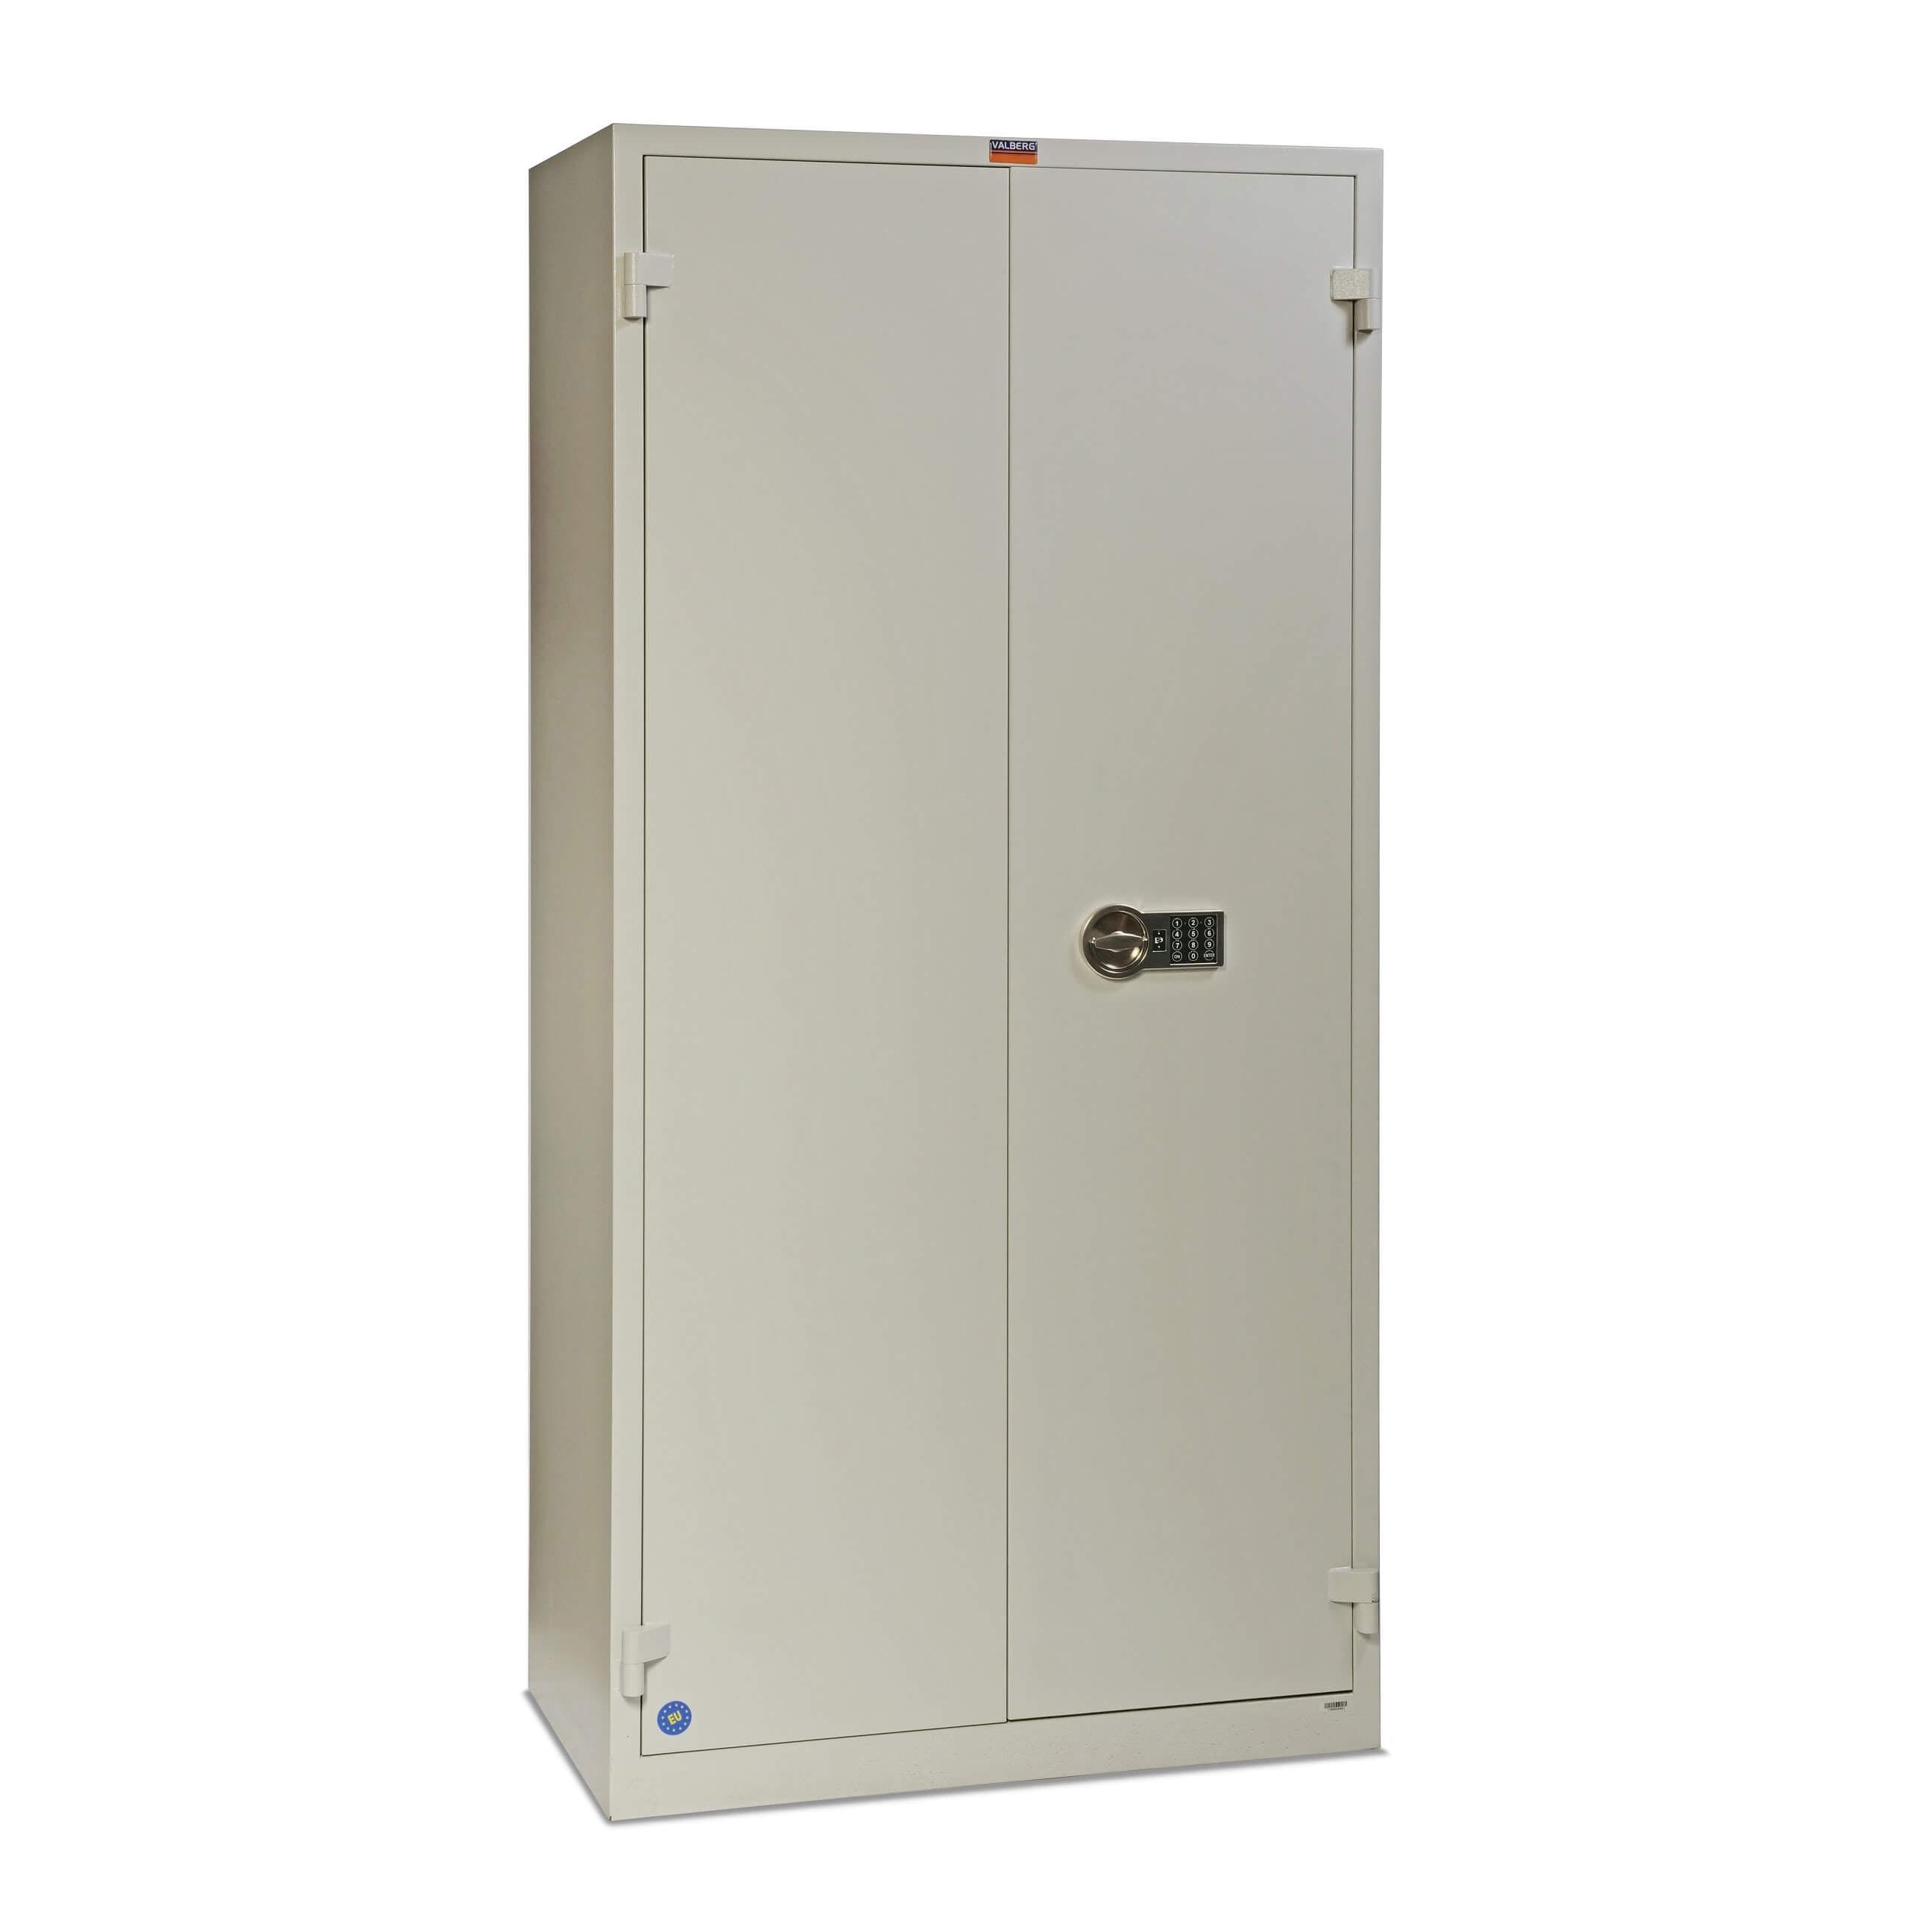 Valberg BM 1993-EL Cabinet Digital Lock Fire Resistant Safe - Grey